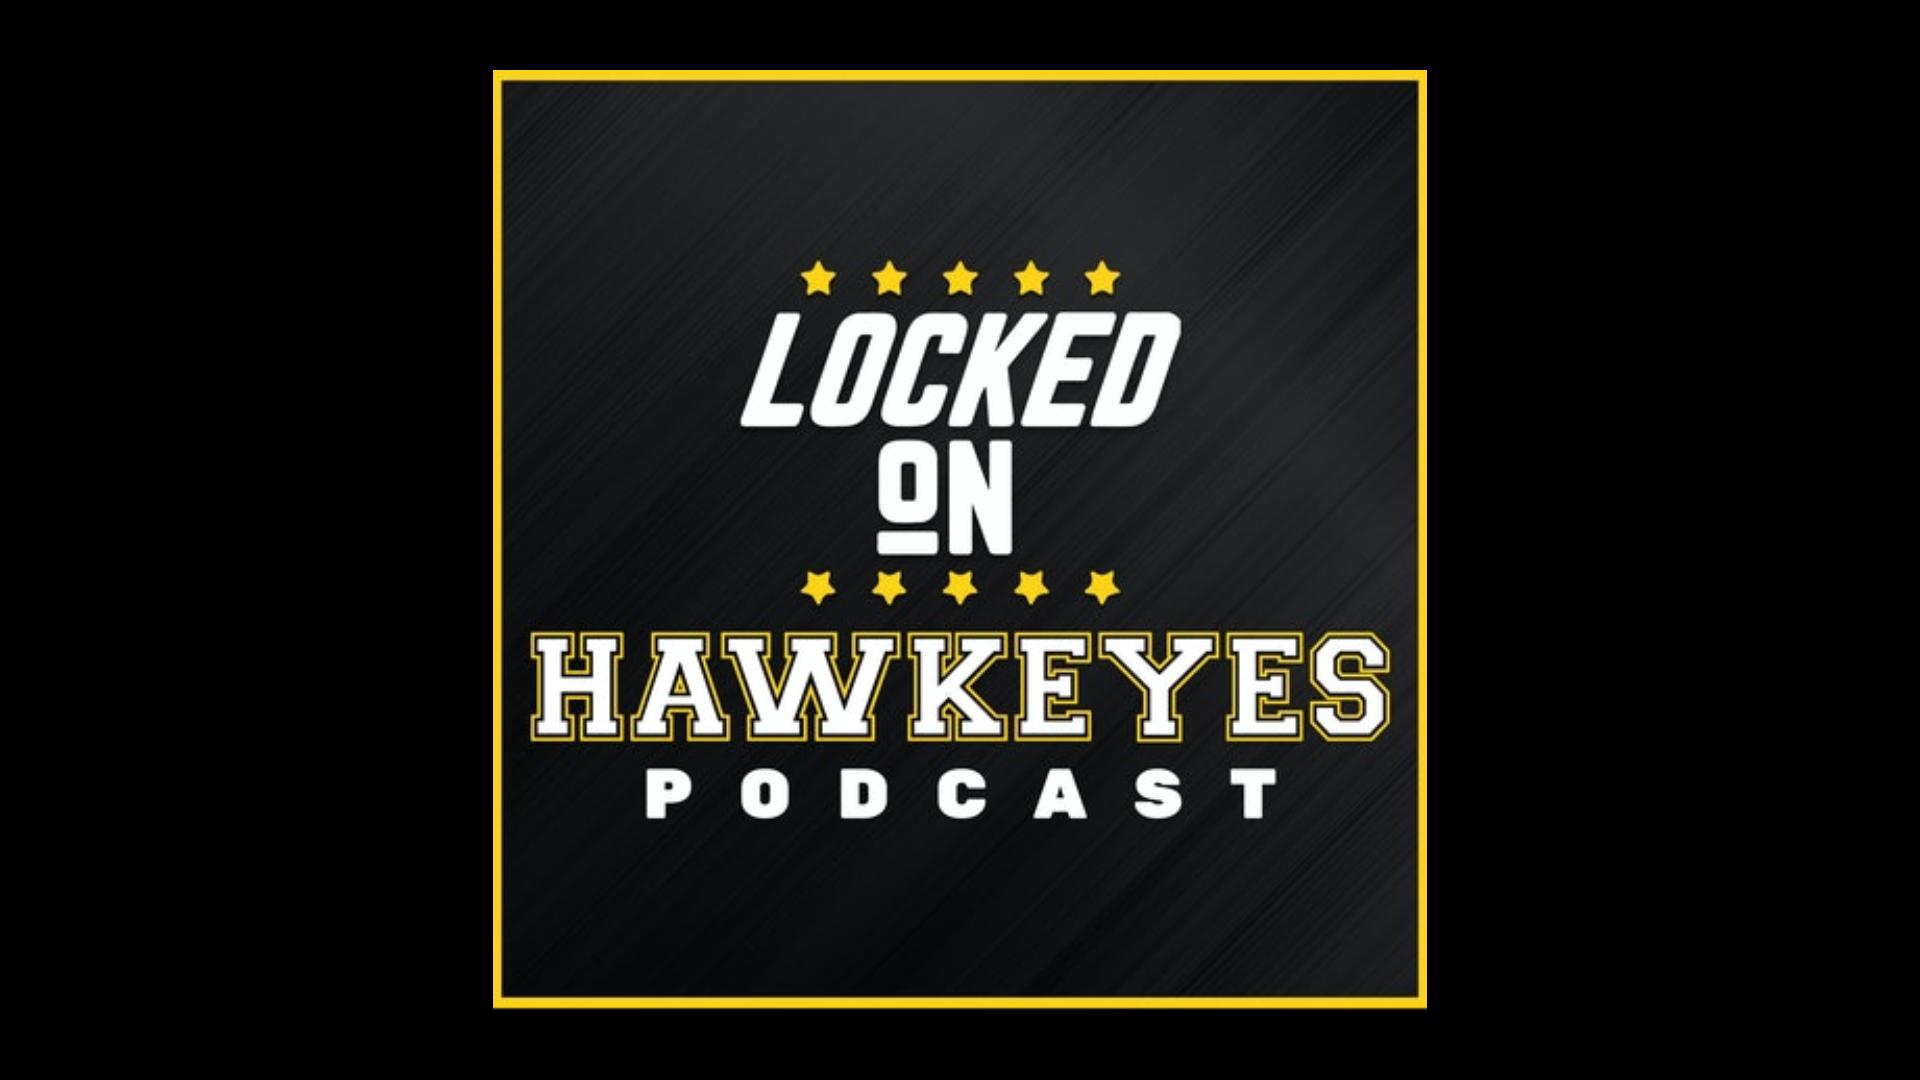 Locked on Hawkeyes